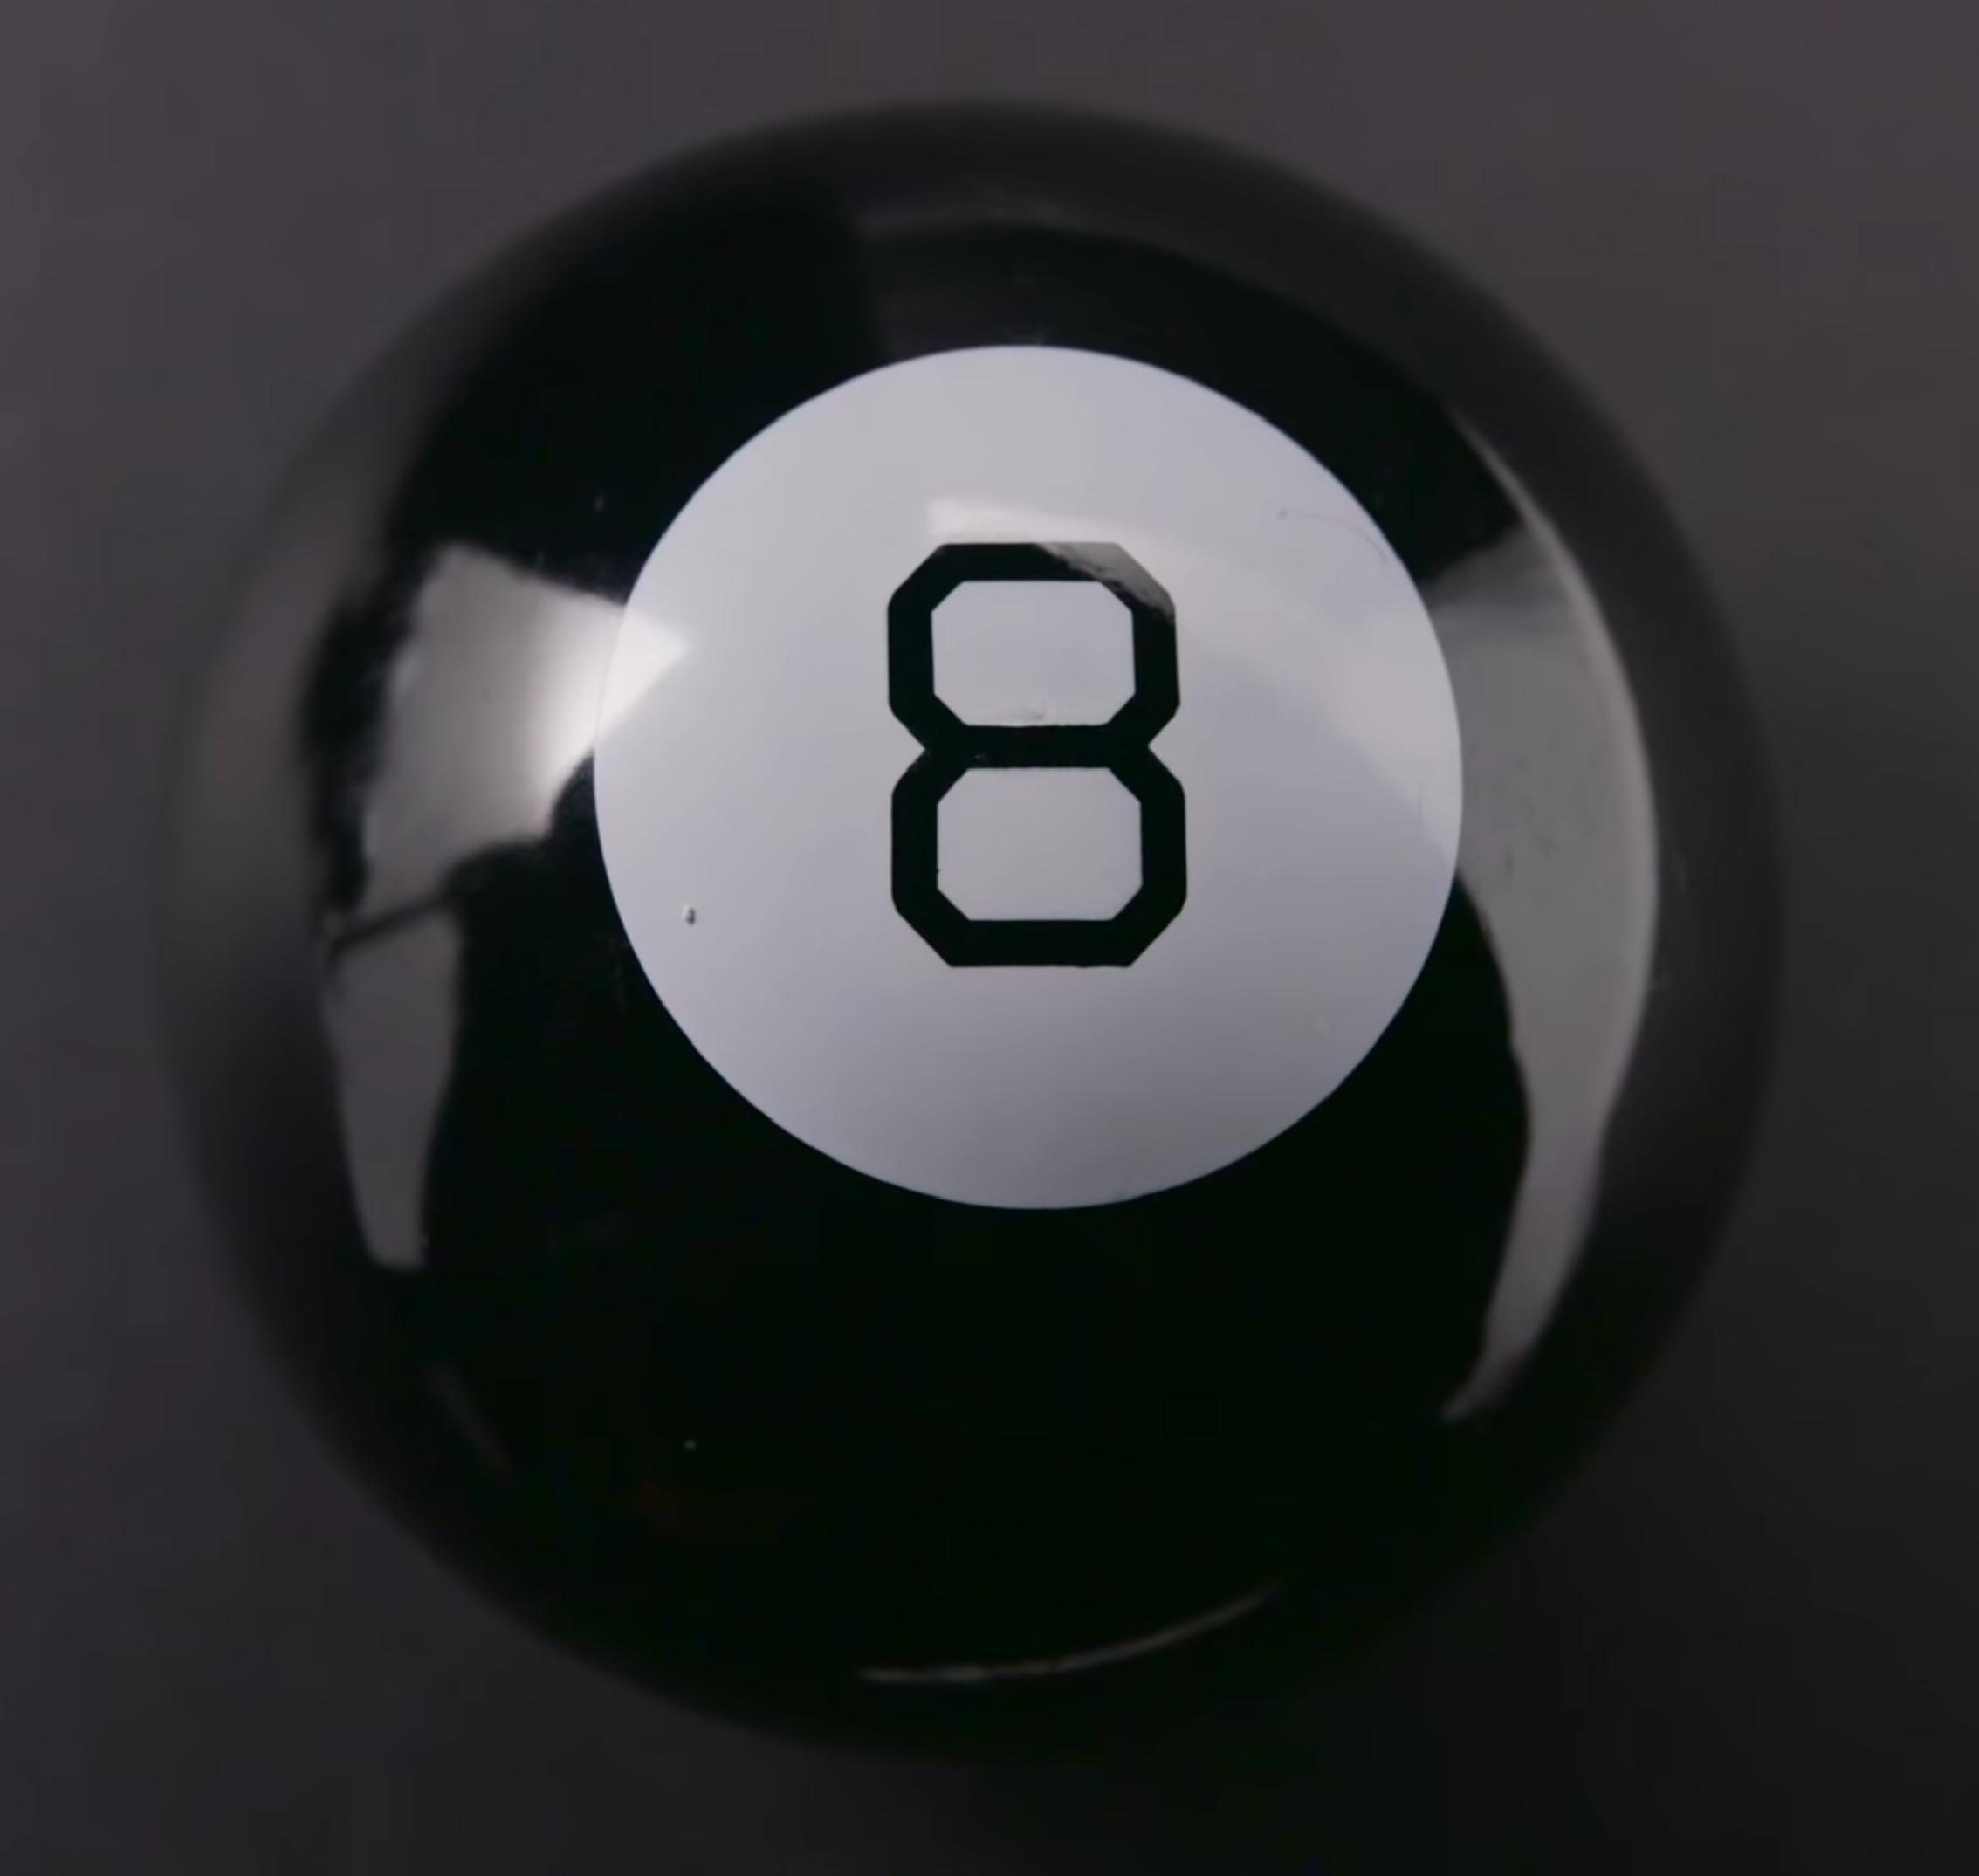 Reko 9 Magic 8 Ball Magic 8 Ball Magic Eightball Gaming Gifts